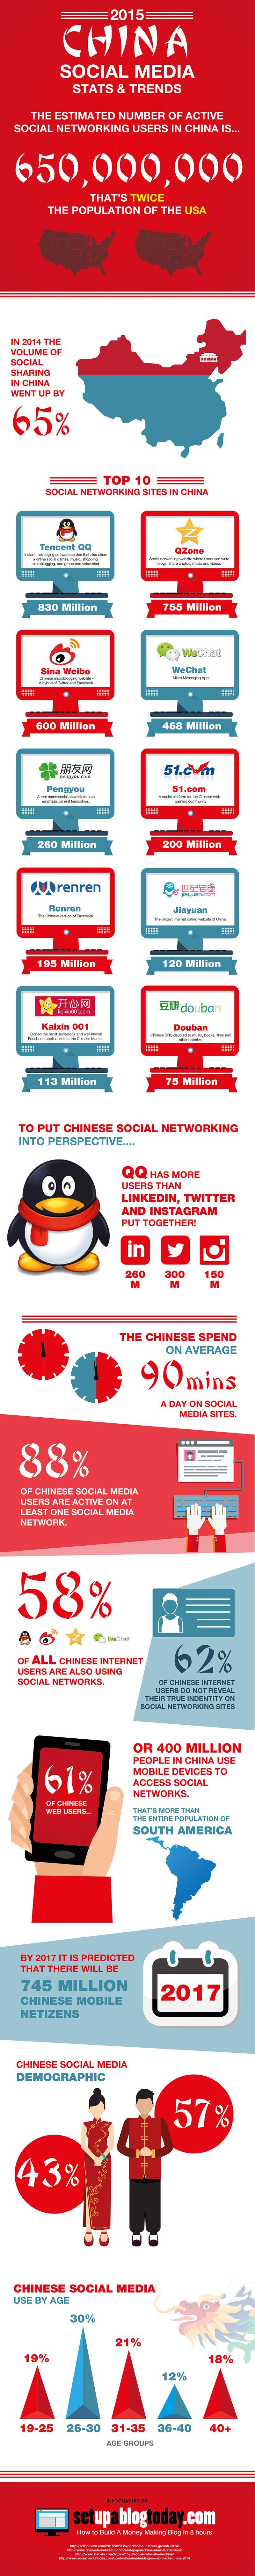 2015-Social-Media-stats-China-Infographic1